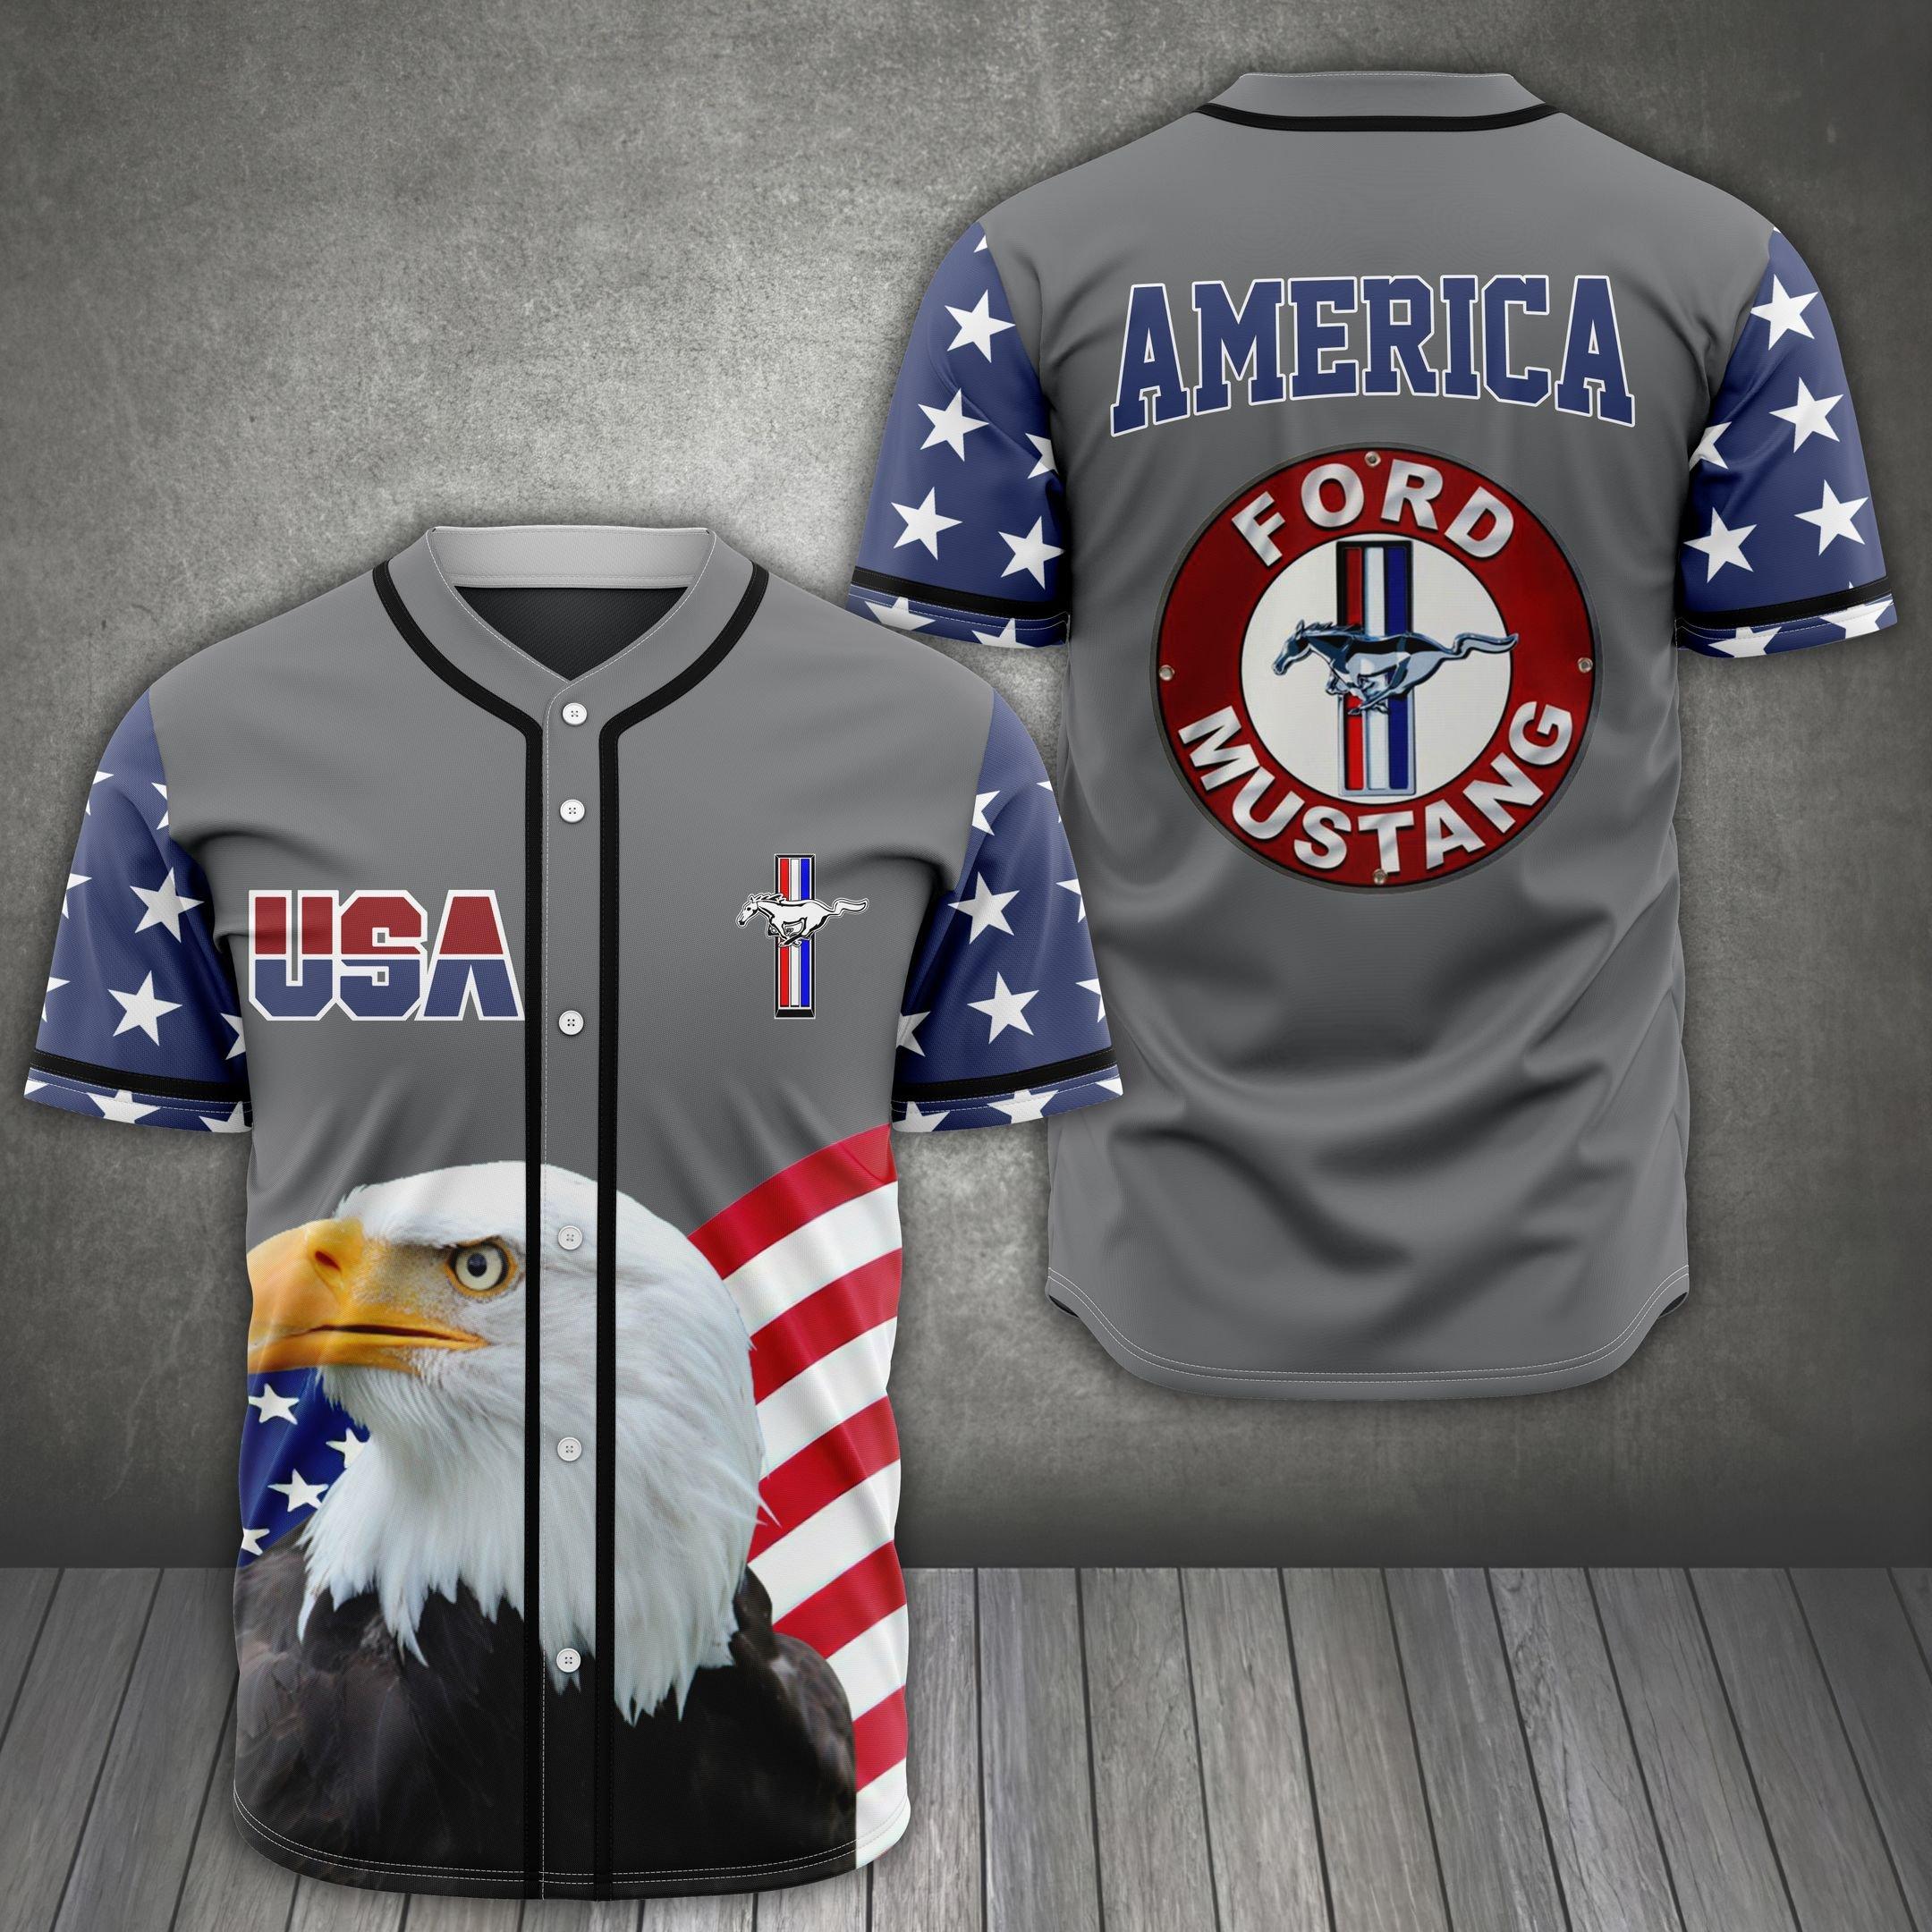 American Eagle Ford Mustang Baseball Jersey Shirt